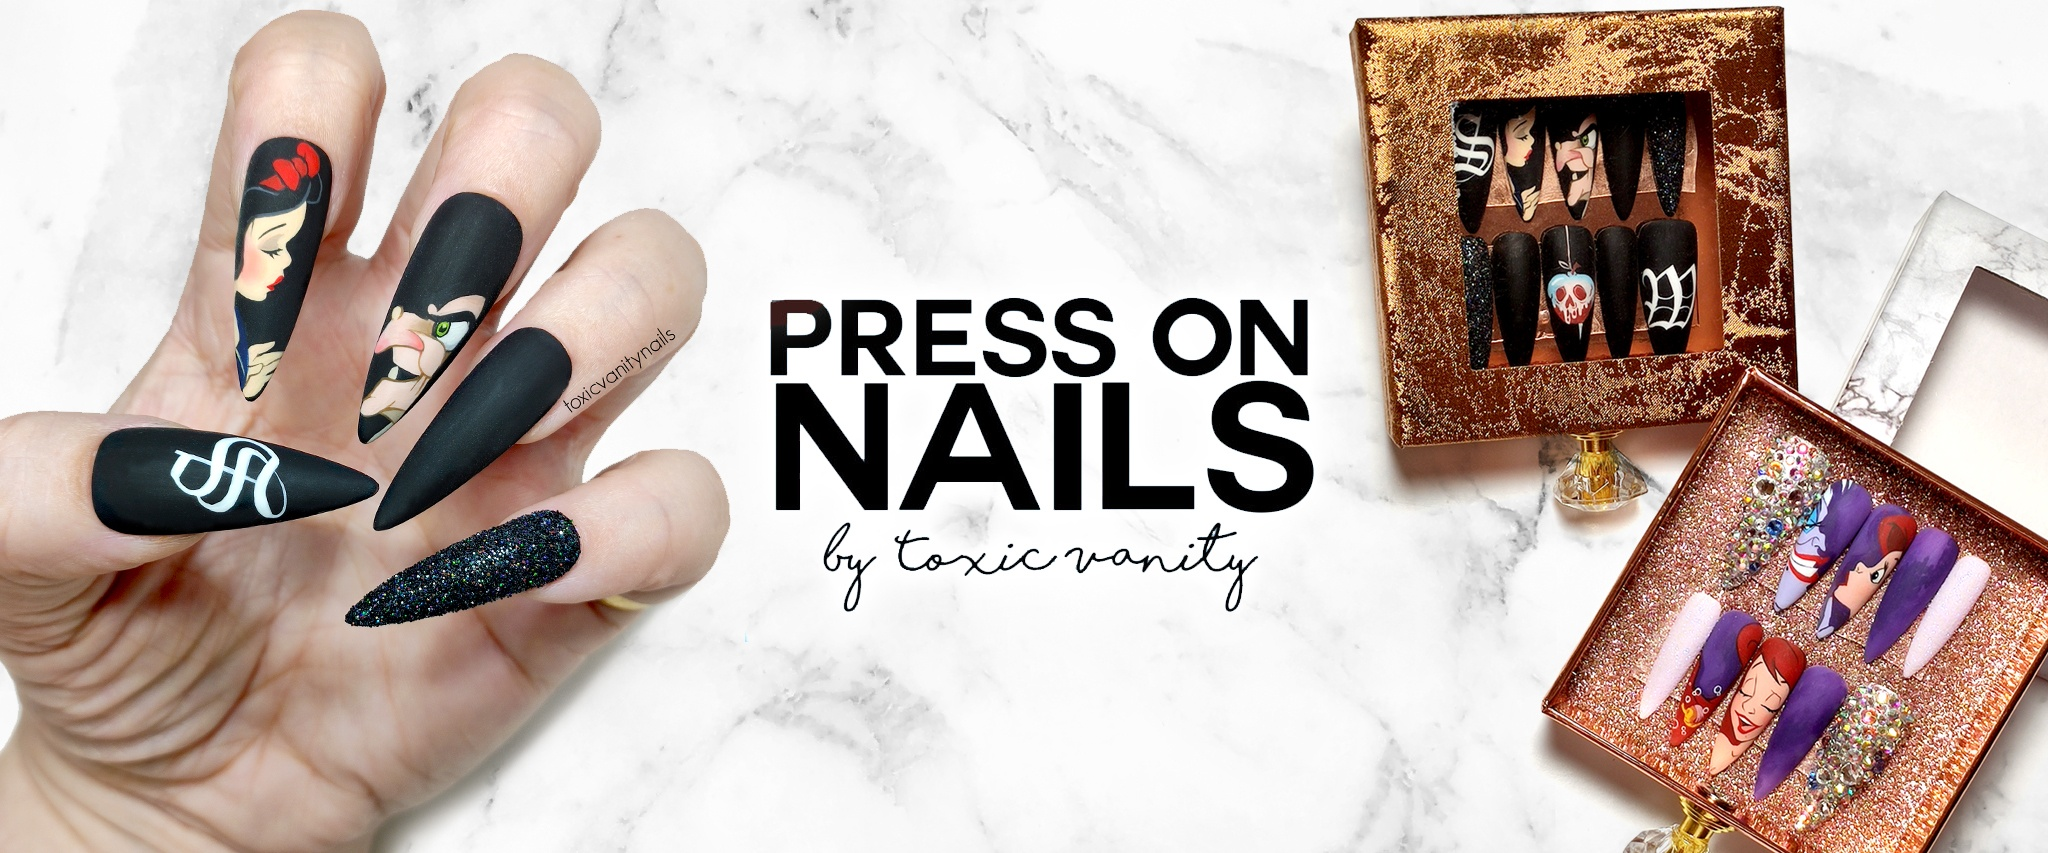 Press on nails 1